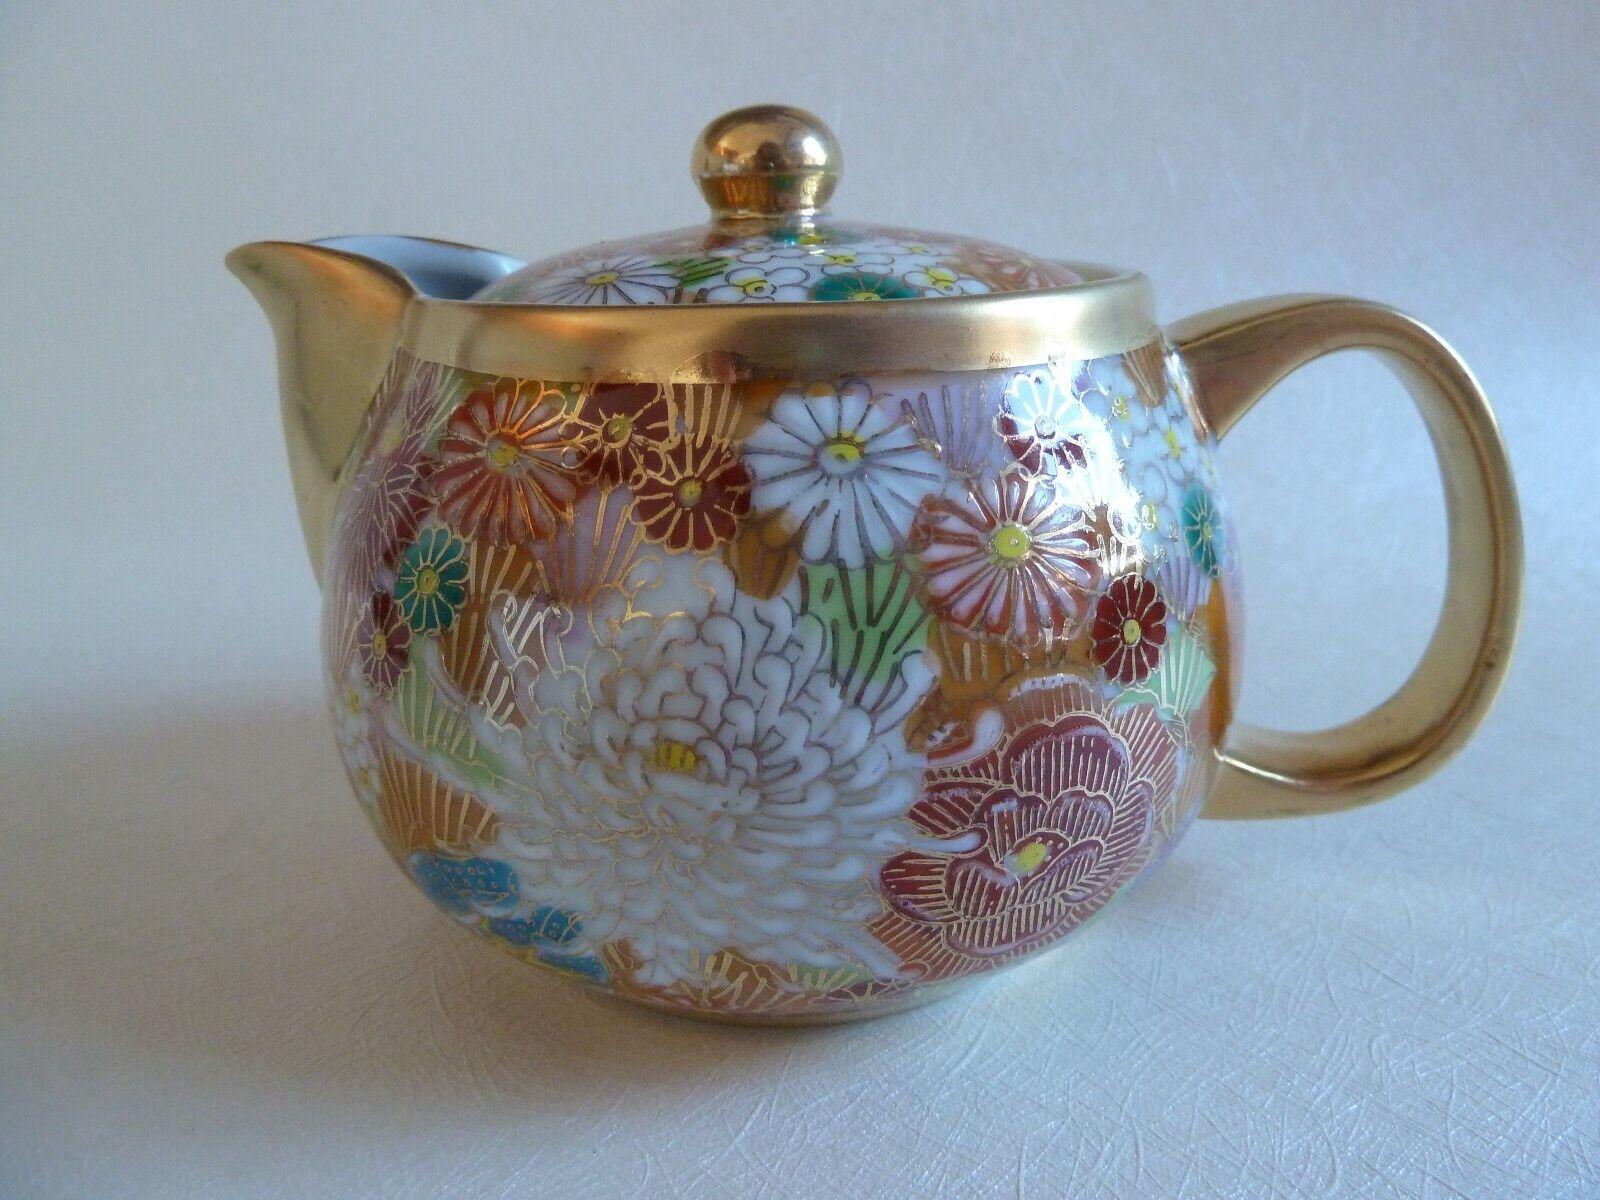 KUTANI Japonaise Théière, Kyusu, KUTANI-yaki, teapot, artisanat, fleurs